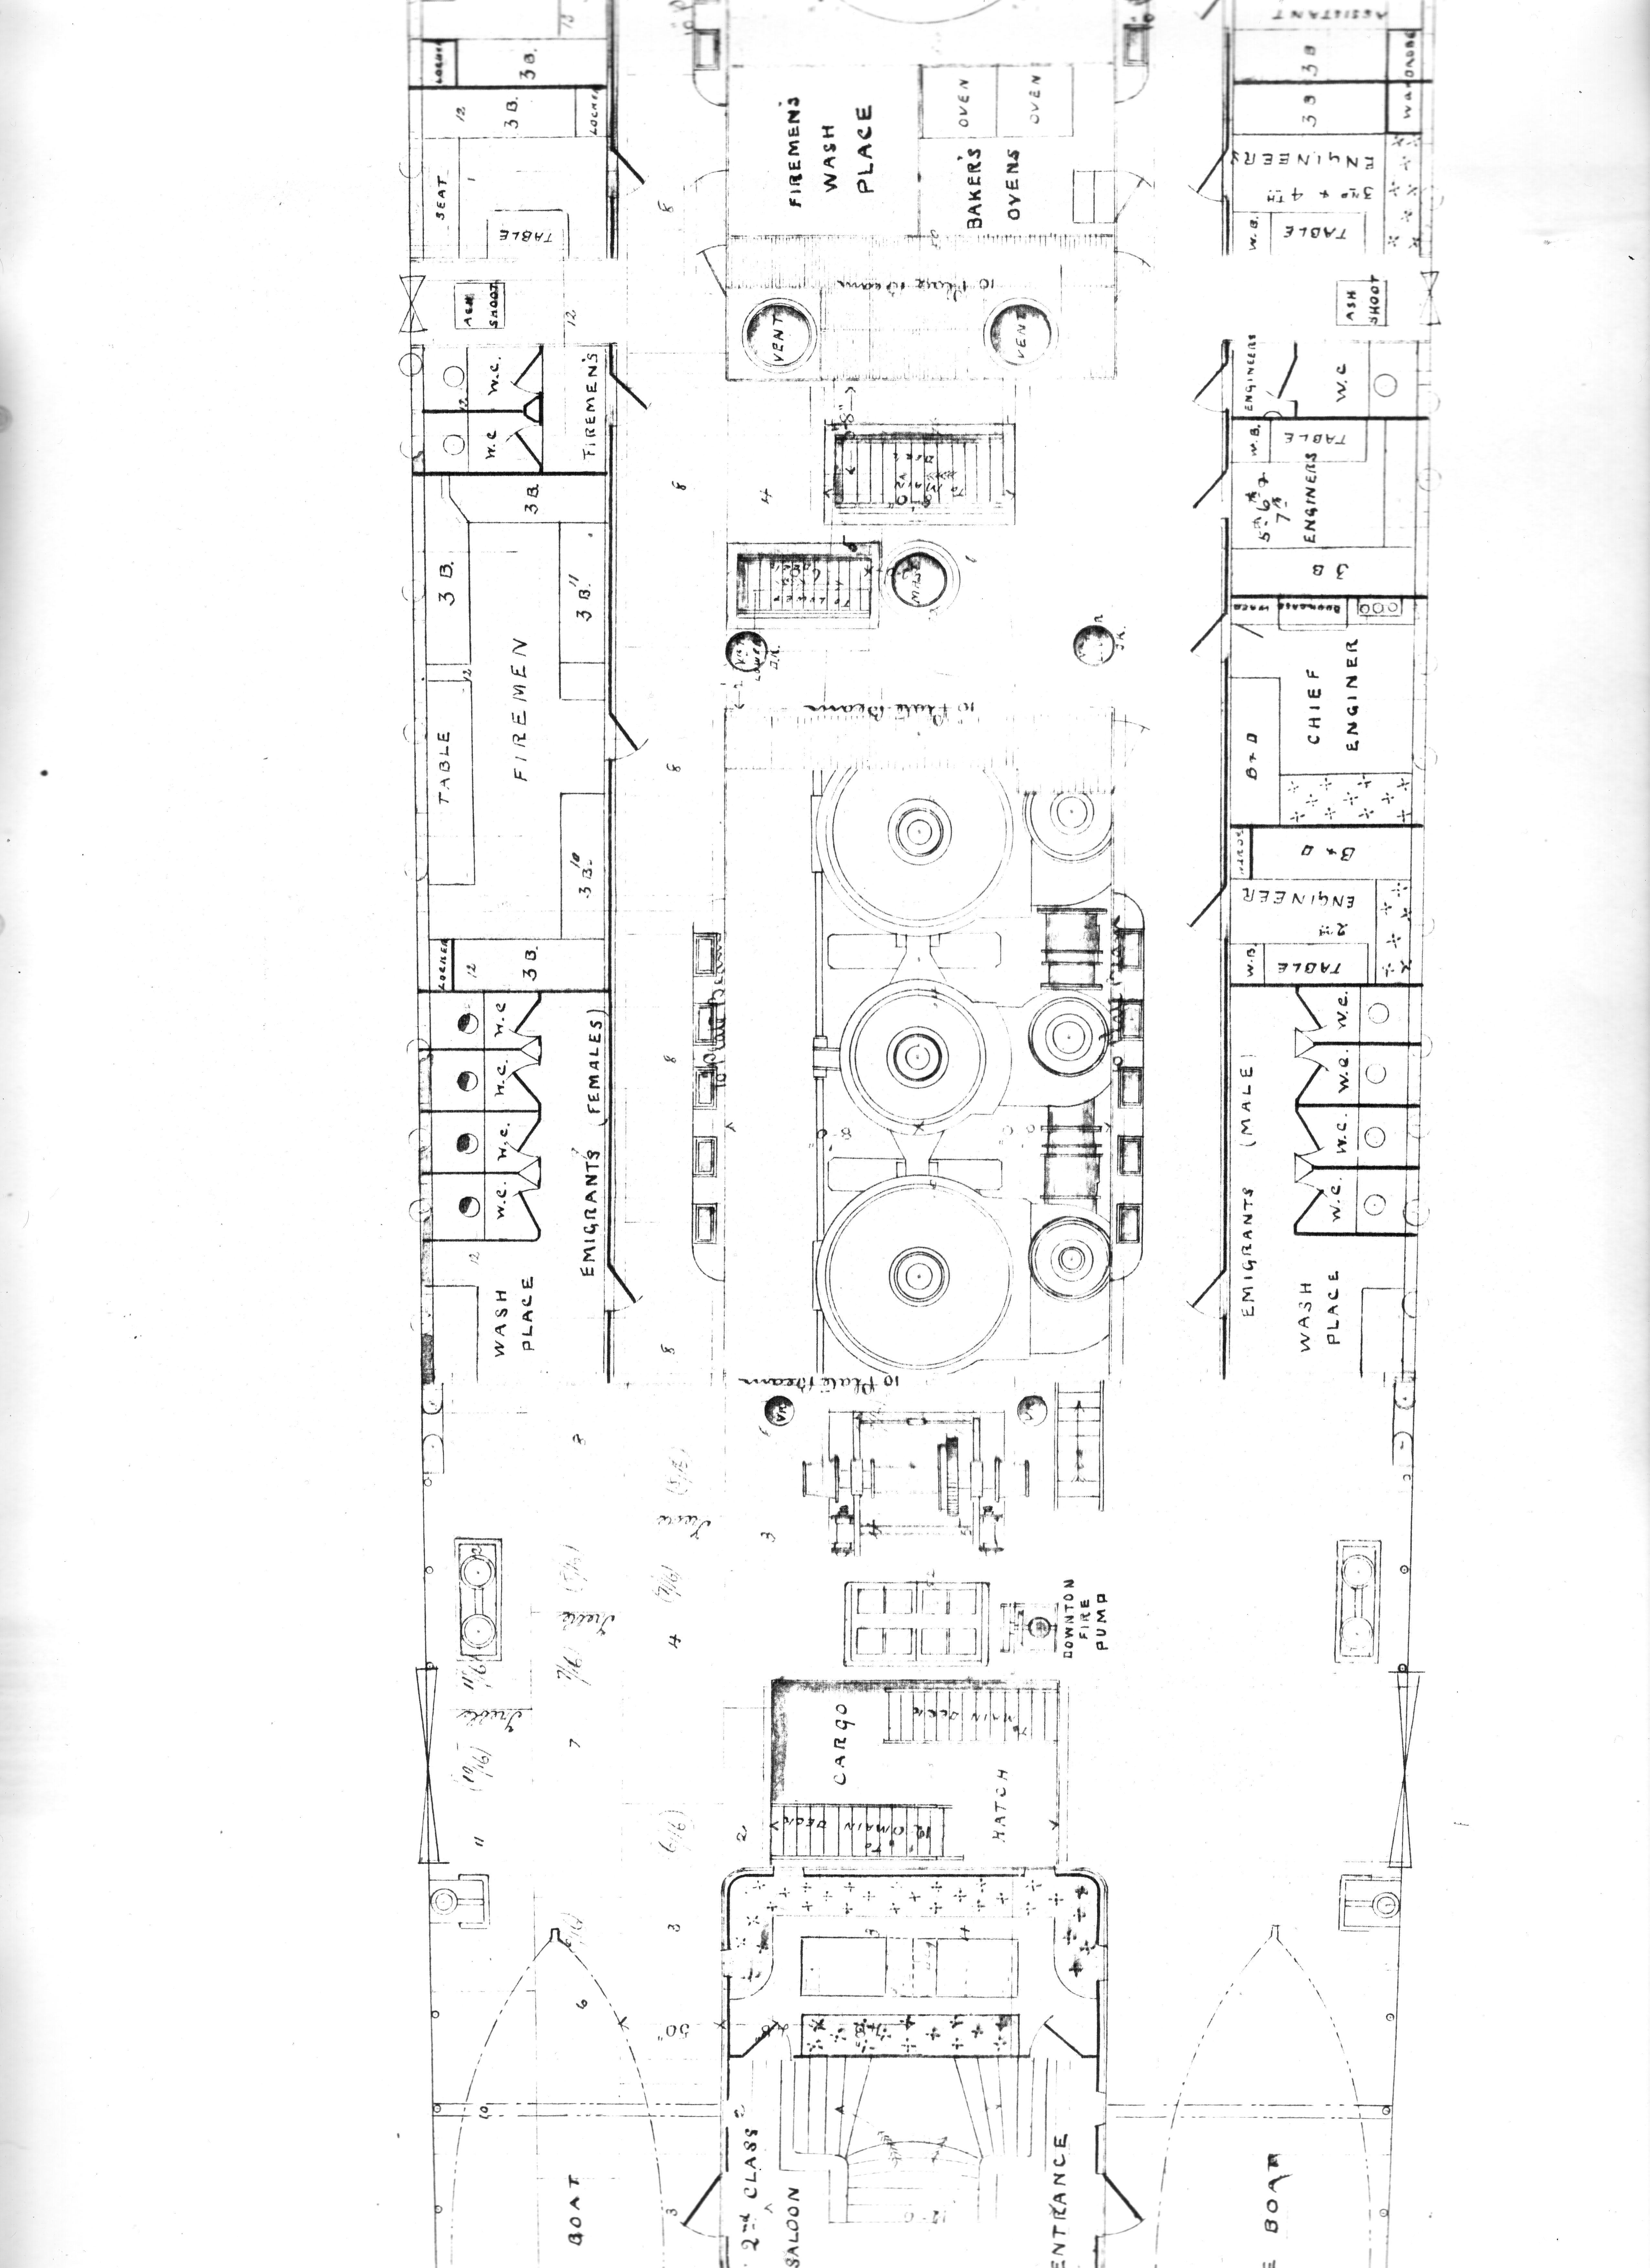 Part Of Blueprint